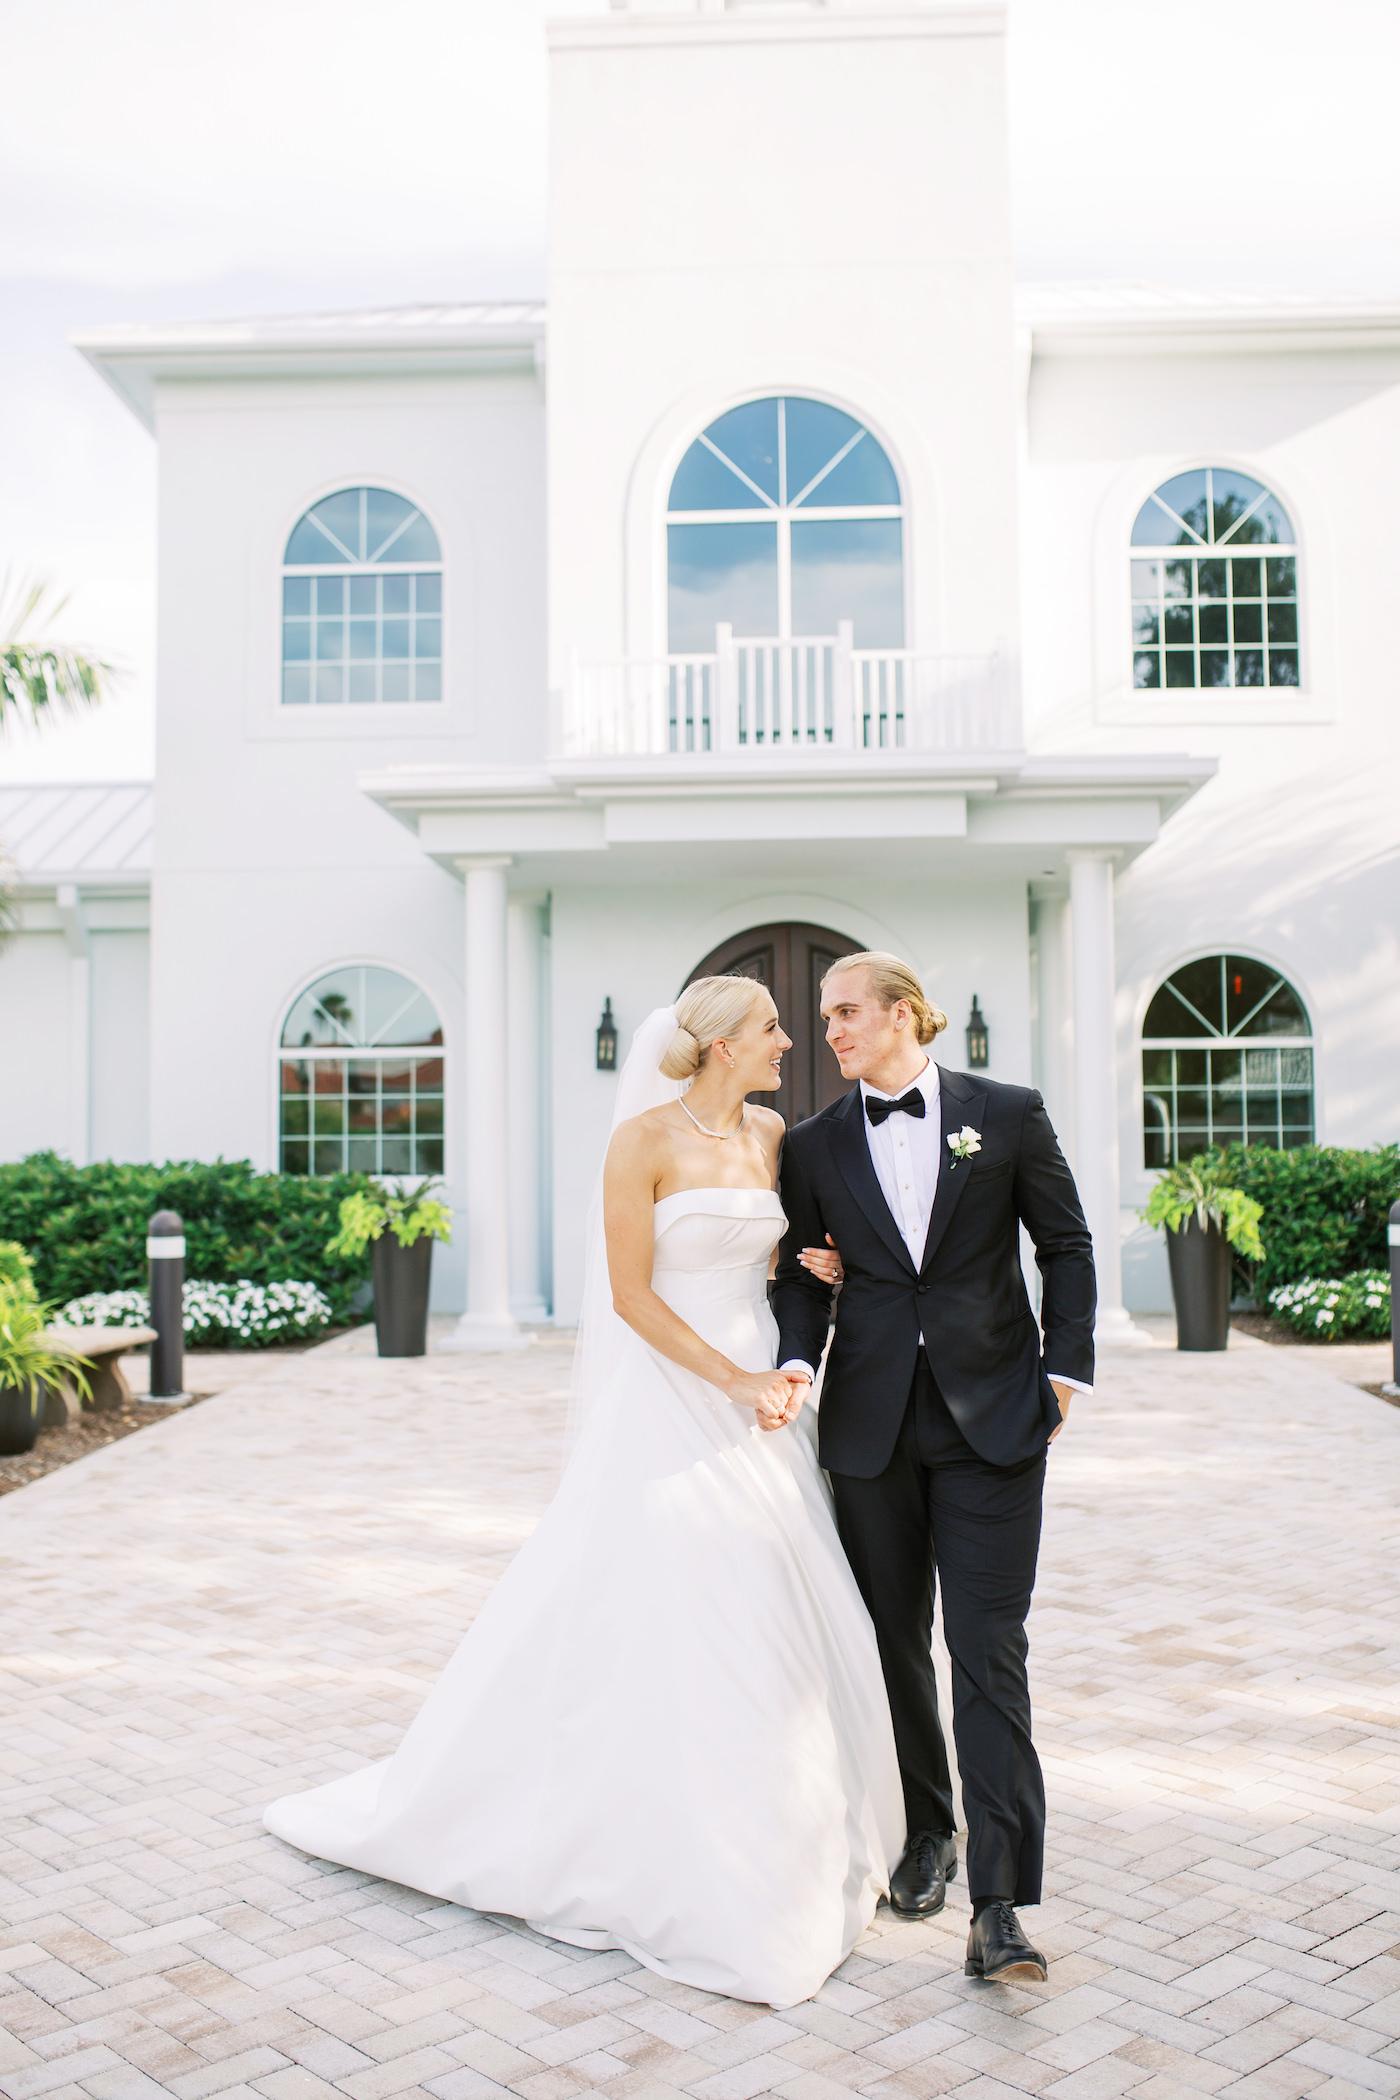 Classic Timeless Bride and Groom Wedding Portrait | Safety Harbor Church Wedding Venue Harborside Chapel